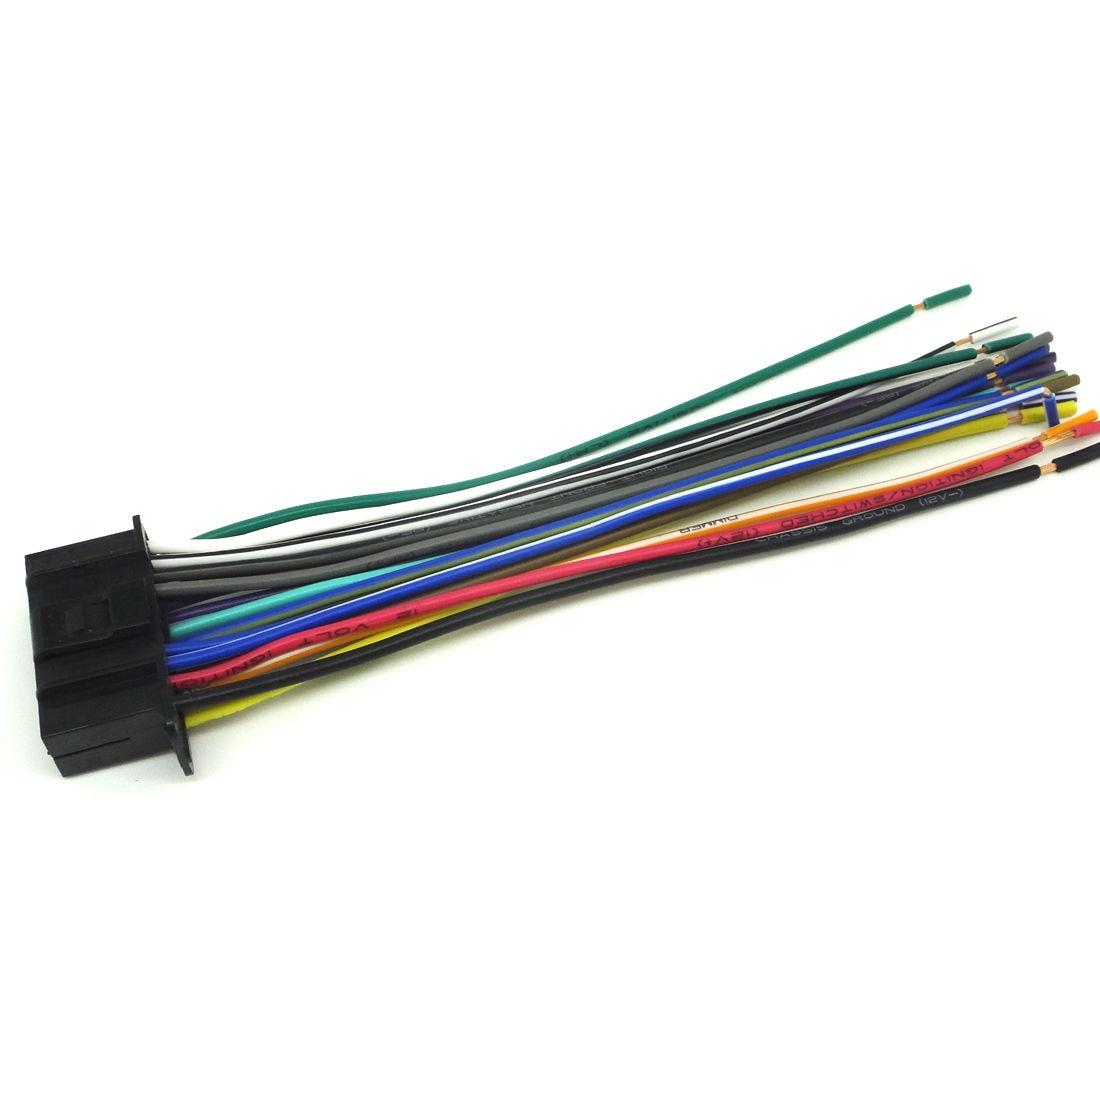 medium resolution of wire harness wiring harness 22 pin for kenwood dnx 6020ex dnx 6040ex dnx 6140 dnx 6160 dnx 6180 dnx 6960 6980